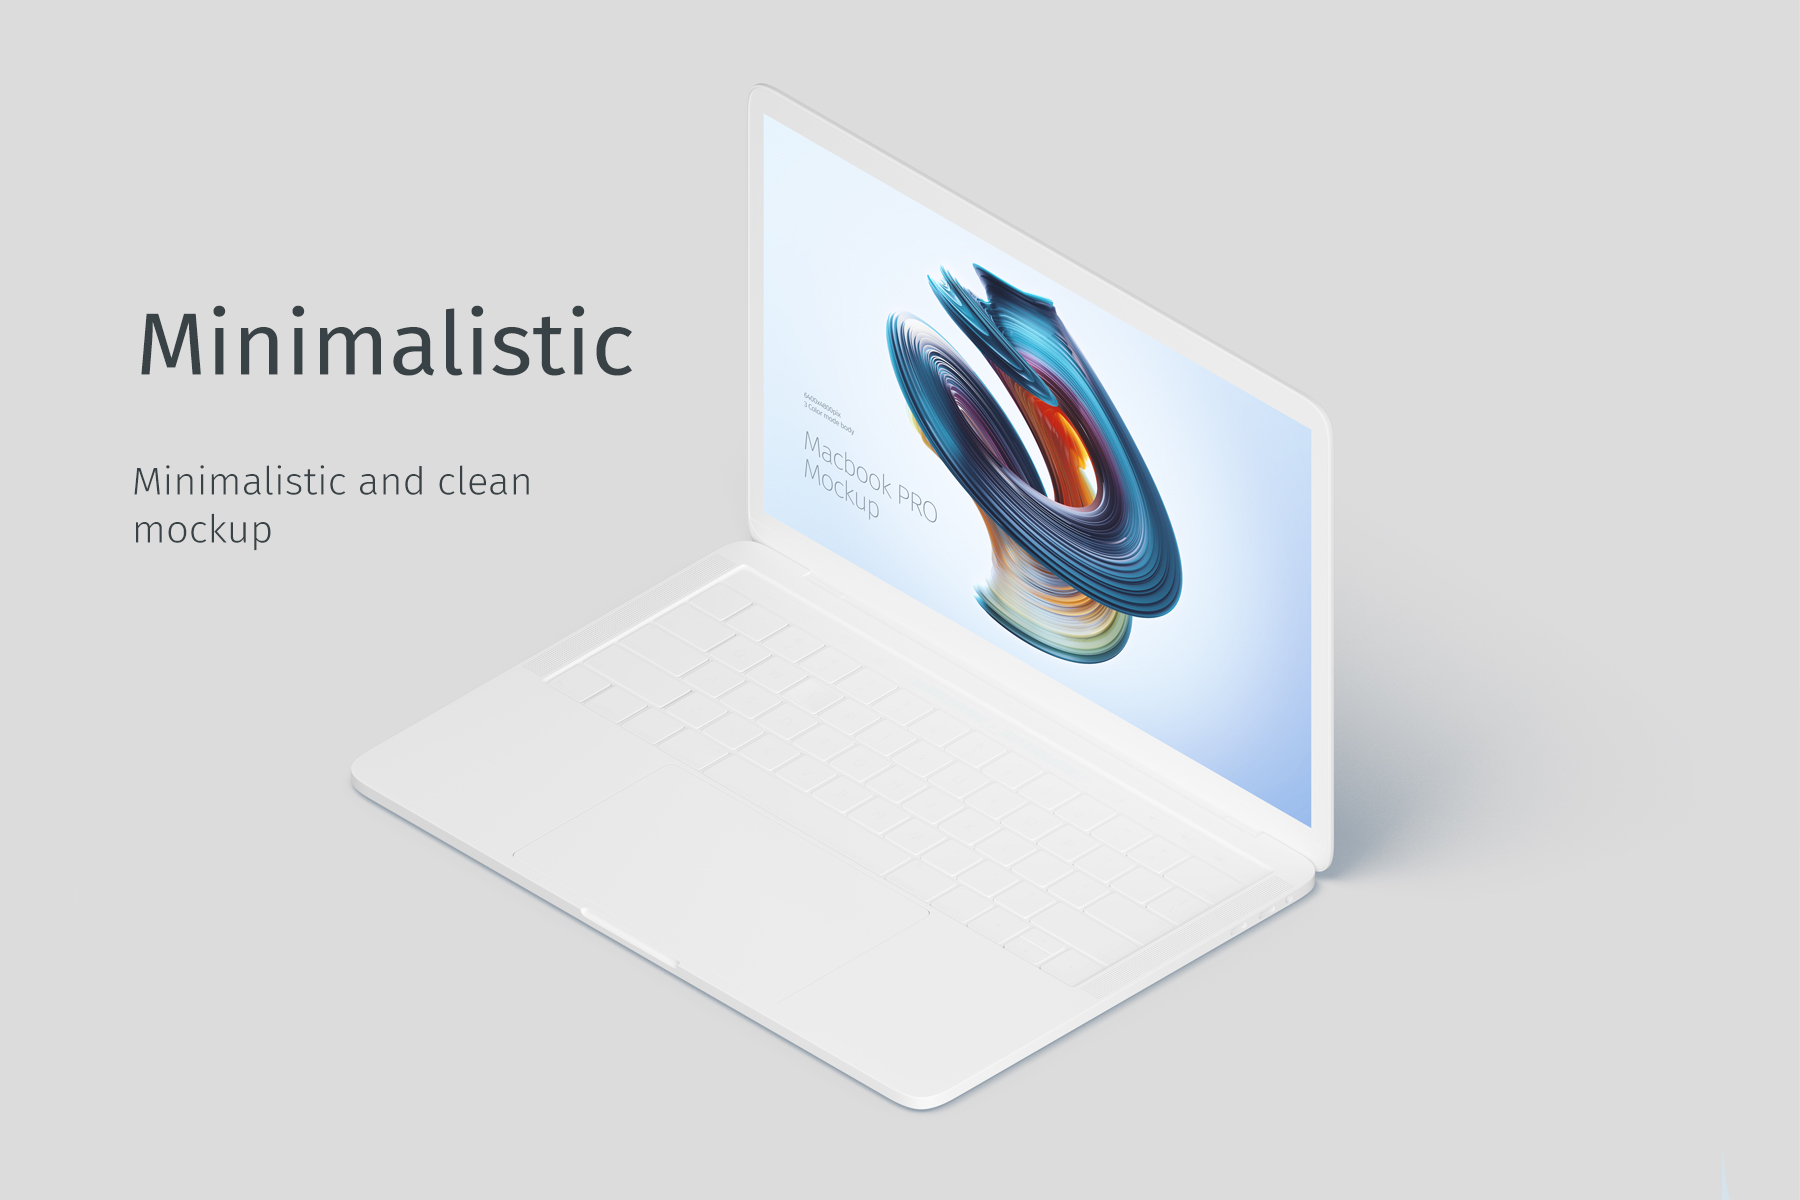 Macbook PRO Creative Mockup example image 4